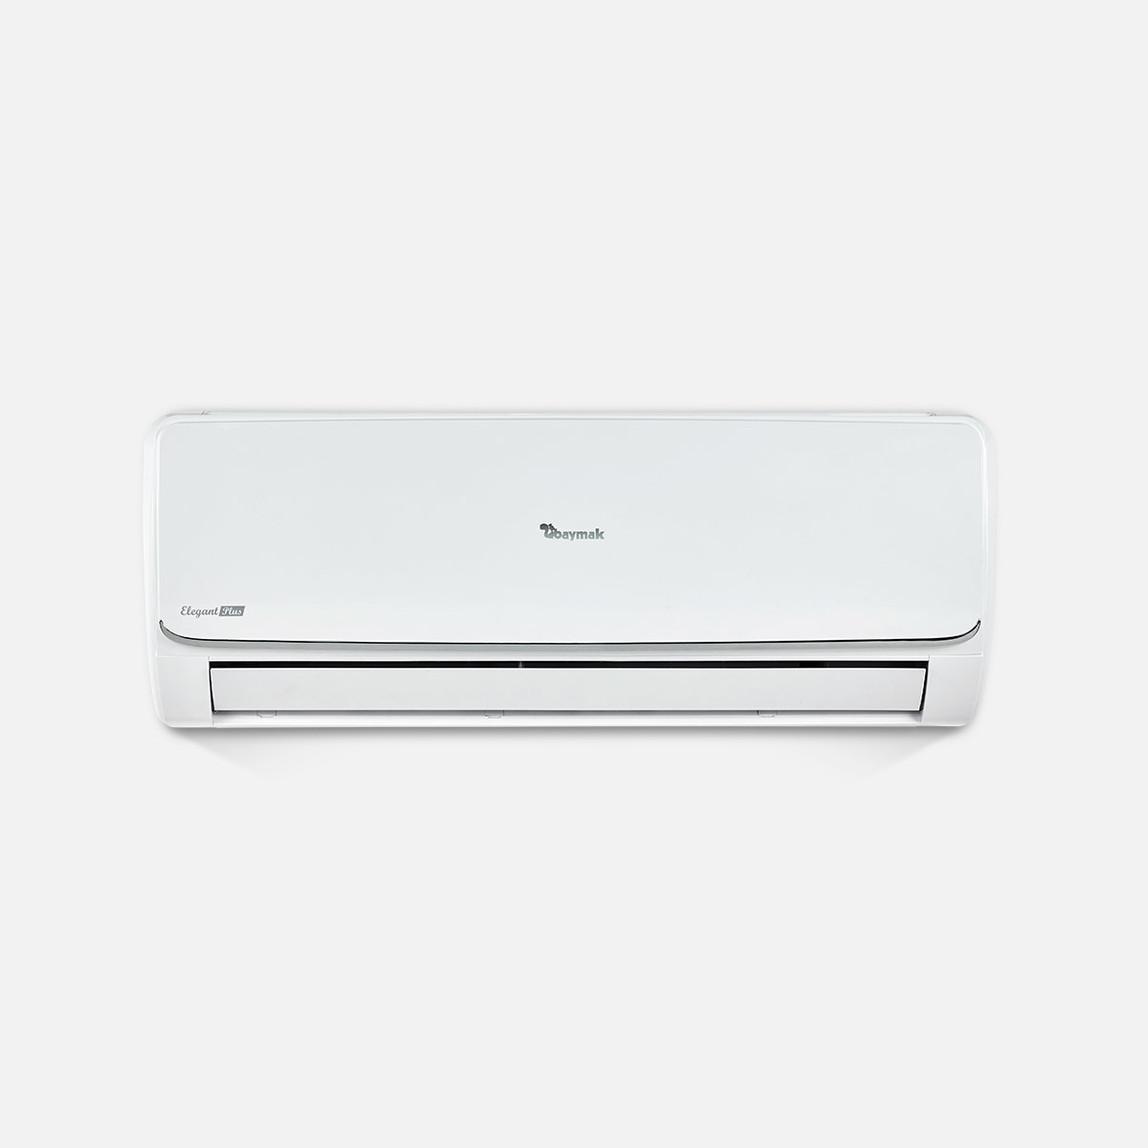 Baymak Elegant Plus R32 09 A++ Montaj Dahil Klima